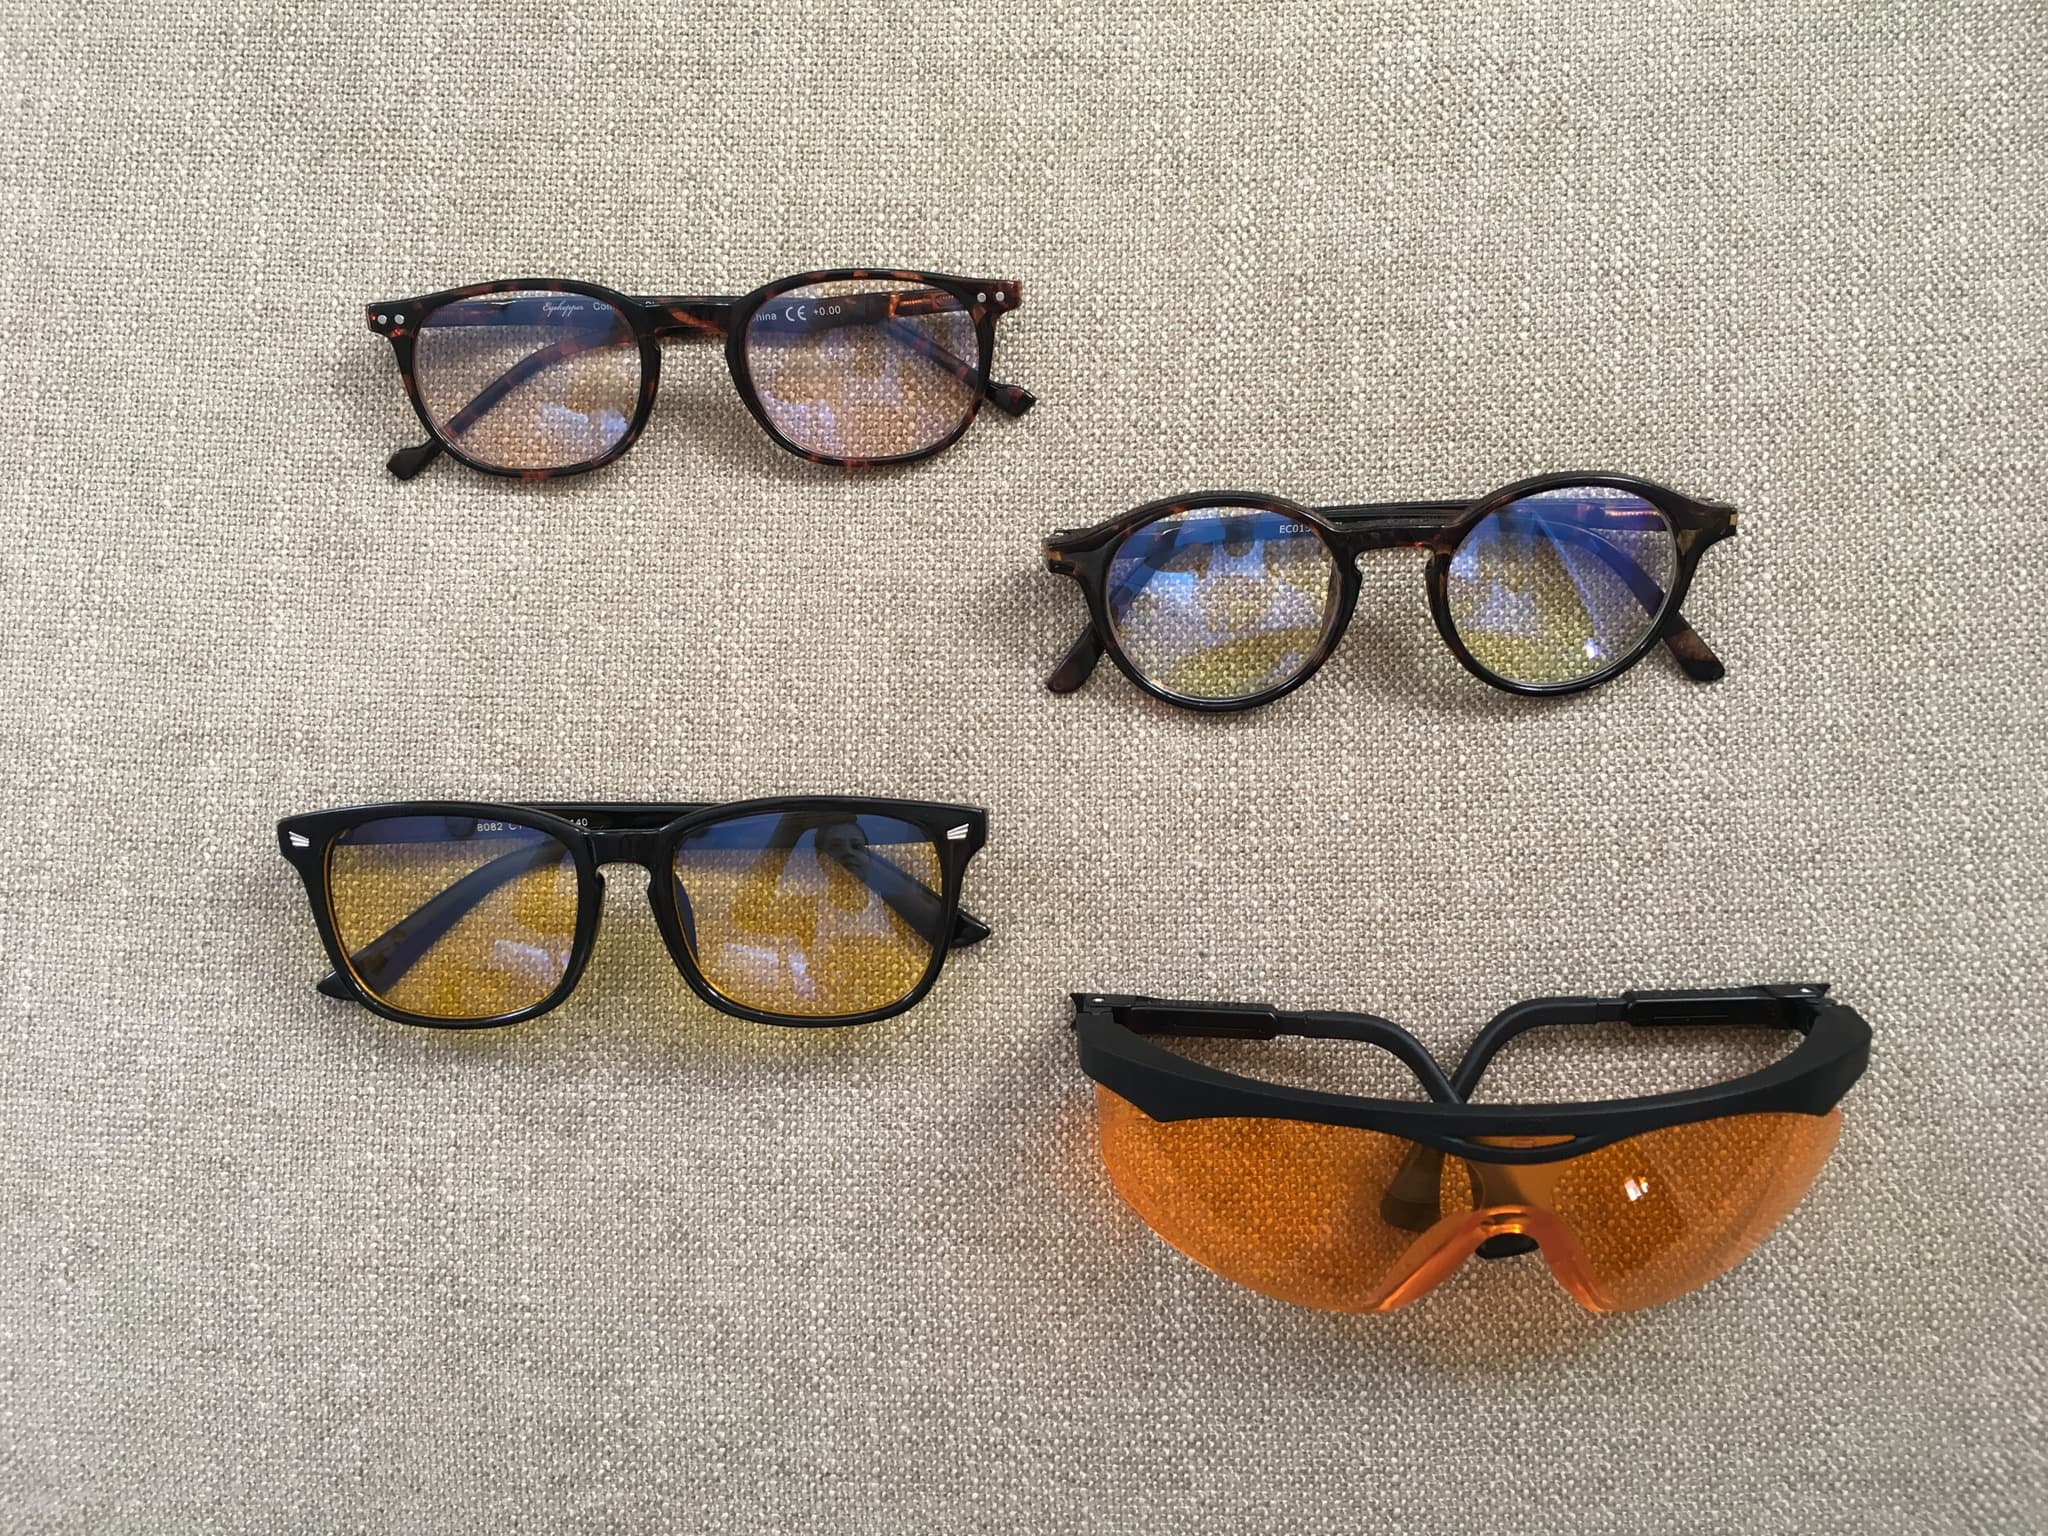 96036d804b4b Best Blue Light Blocking Glasses - All Your Options